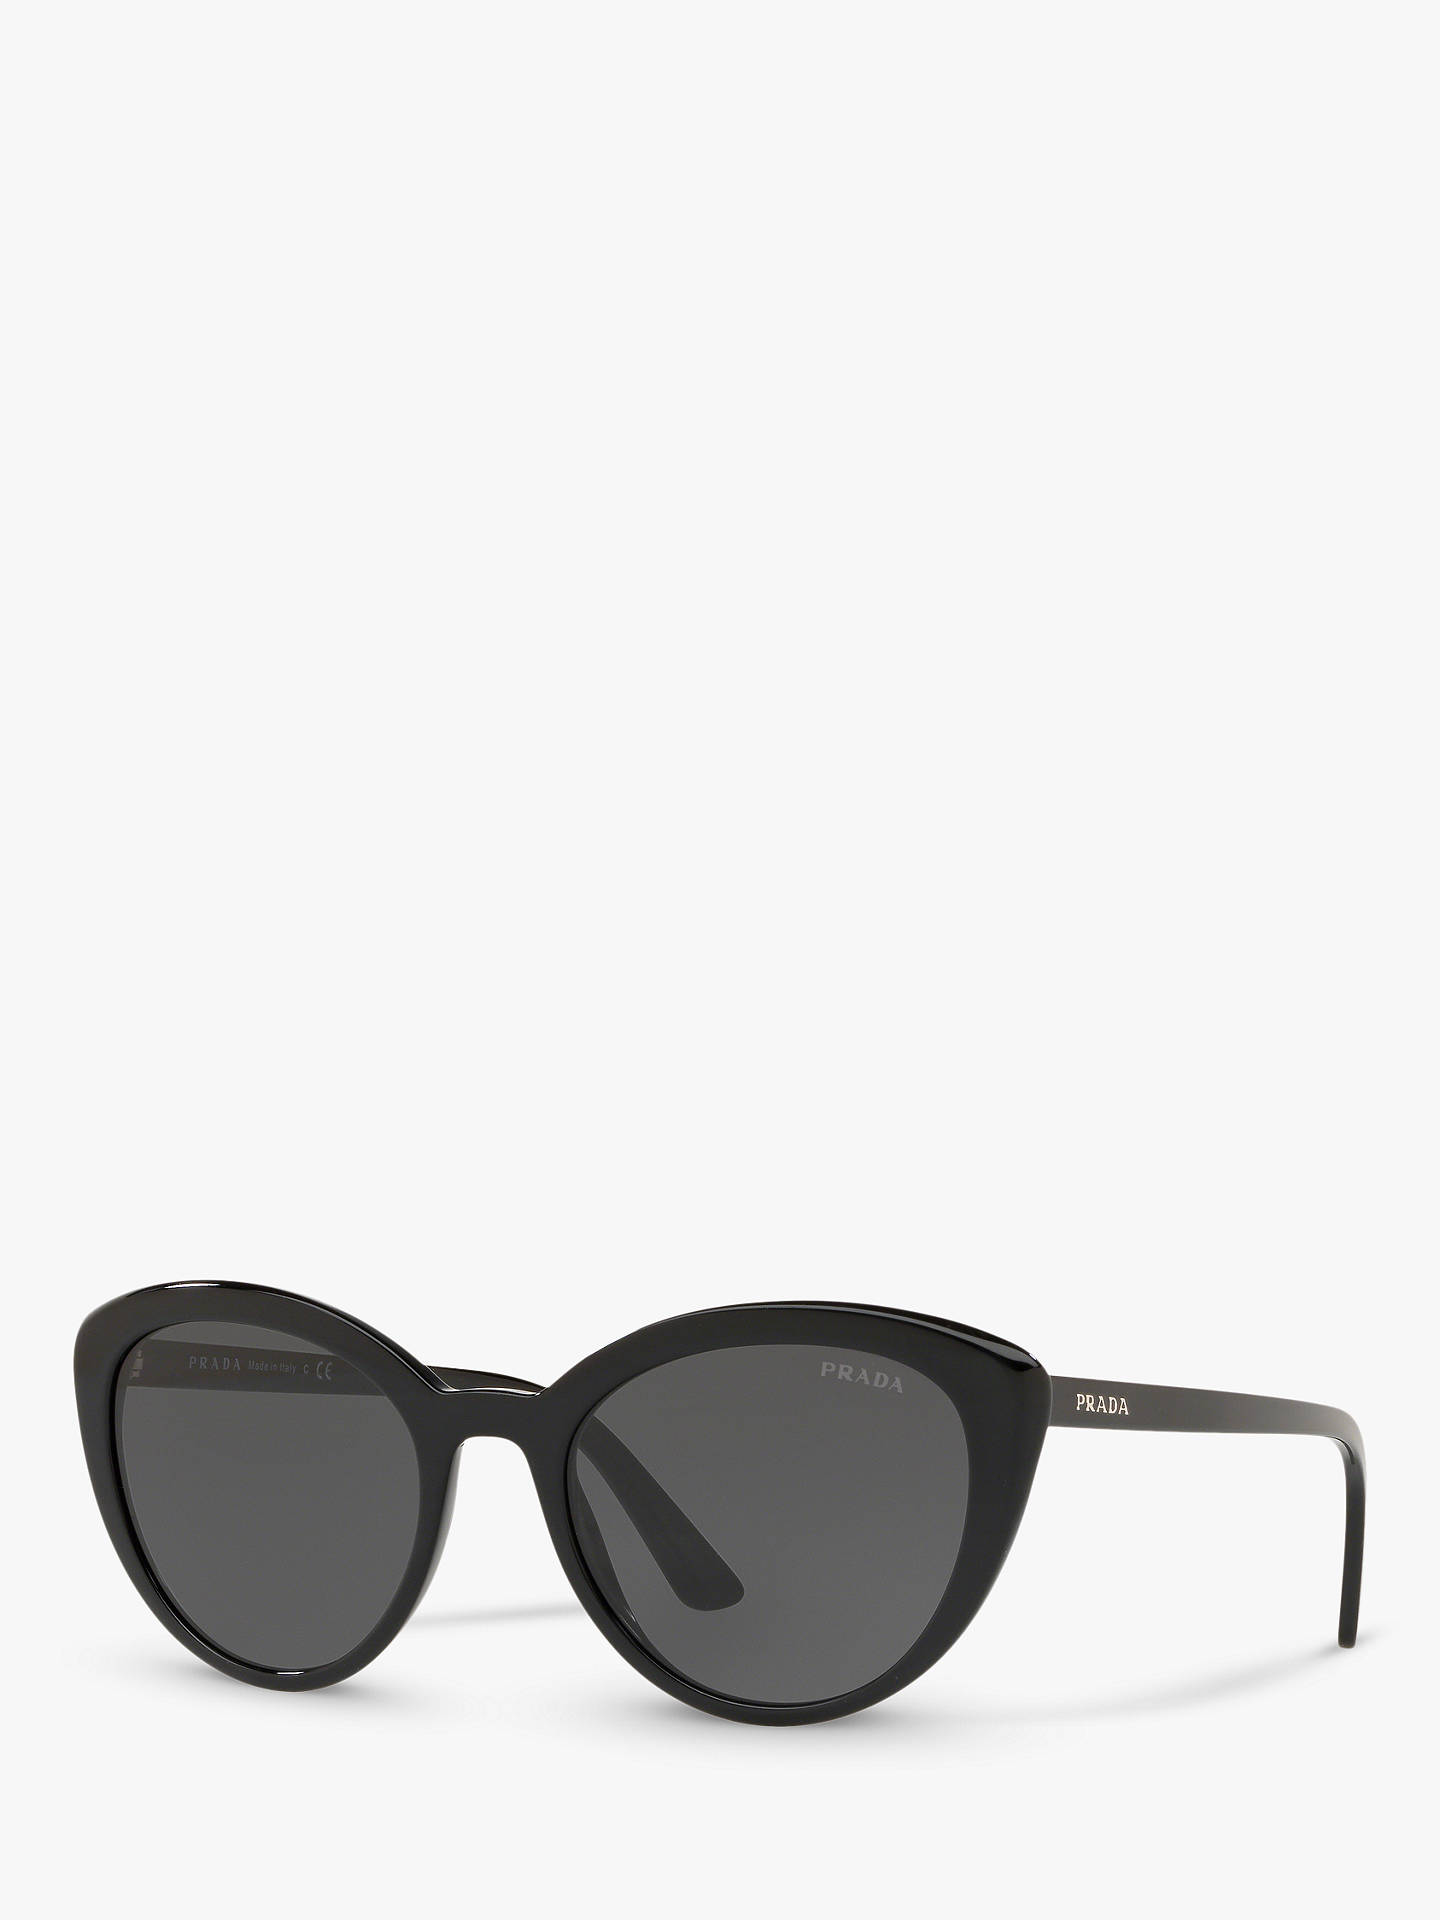 395500cd905 Buy Prada PR 02VS Women s Cat s Eye Sunglasses